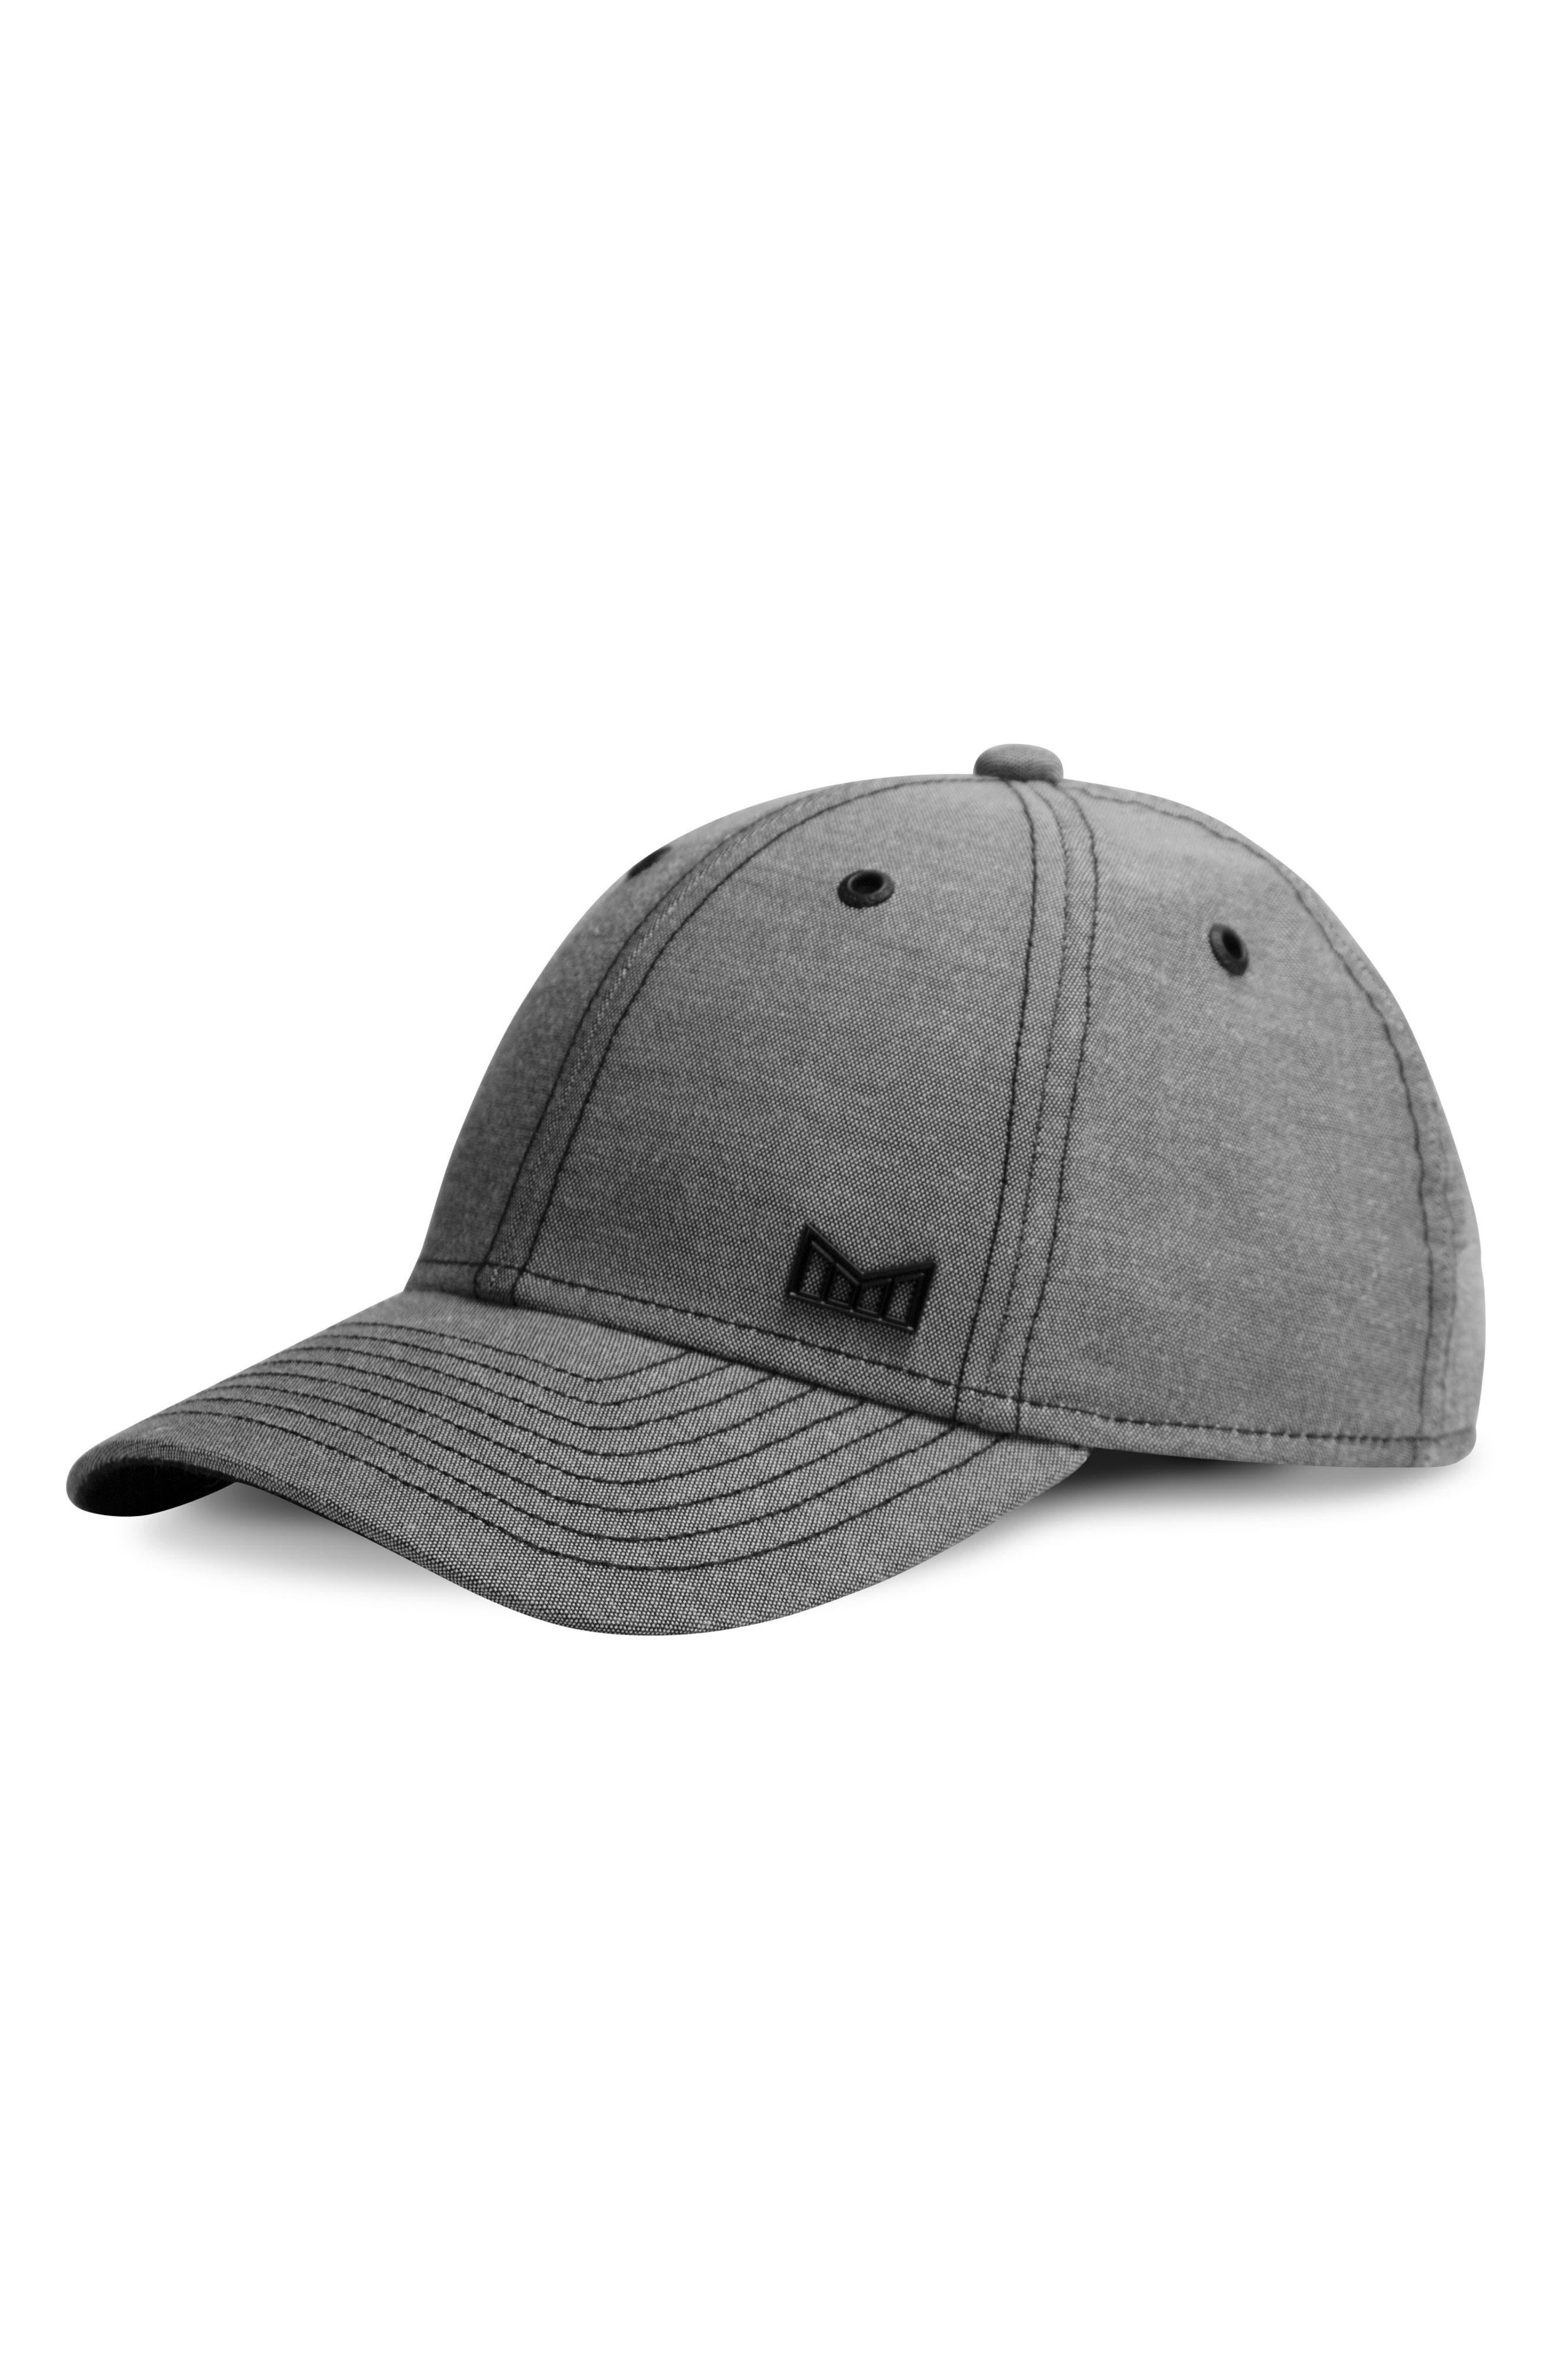 Scholar Snapback Baseball Cap,                             Main thumbnail 1, color,                             001